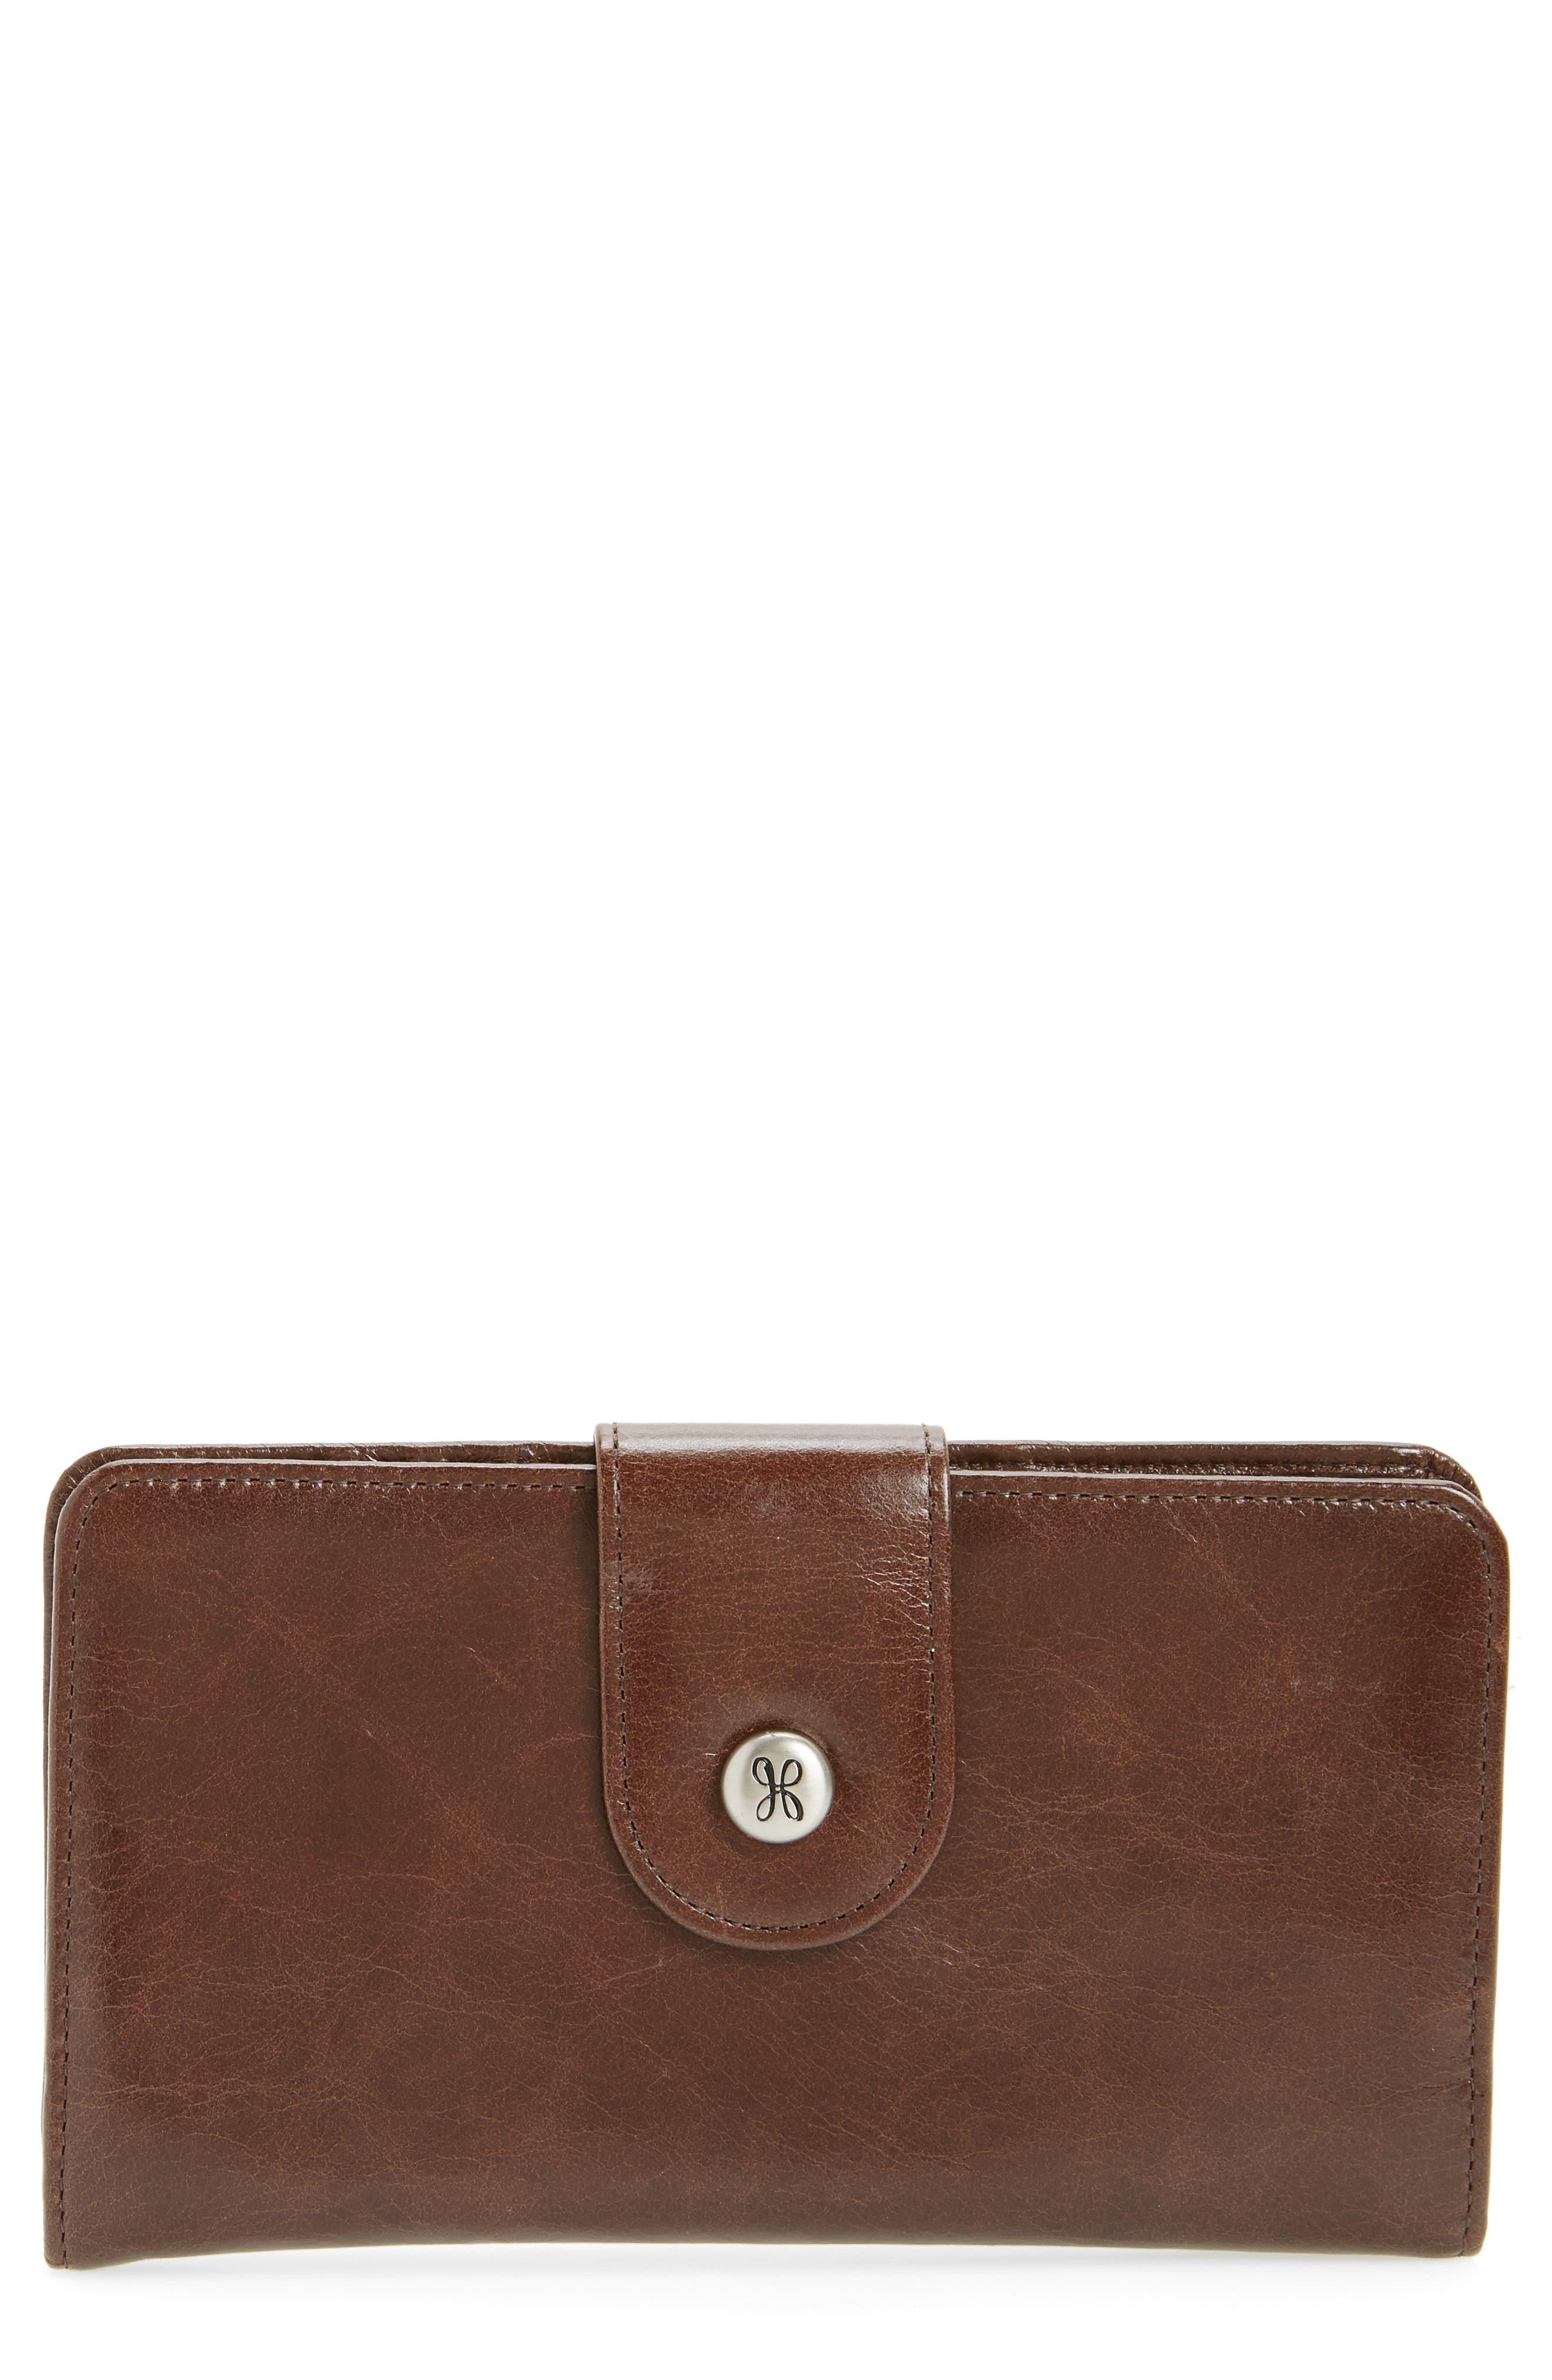 Hobo 'Danette' Glazed Leather Continental Wallet